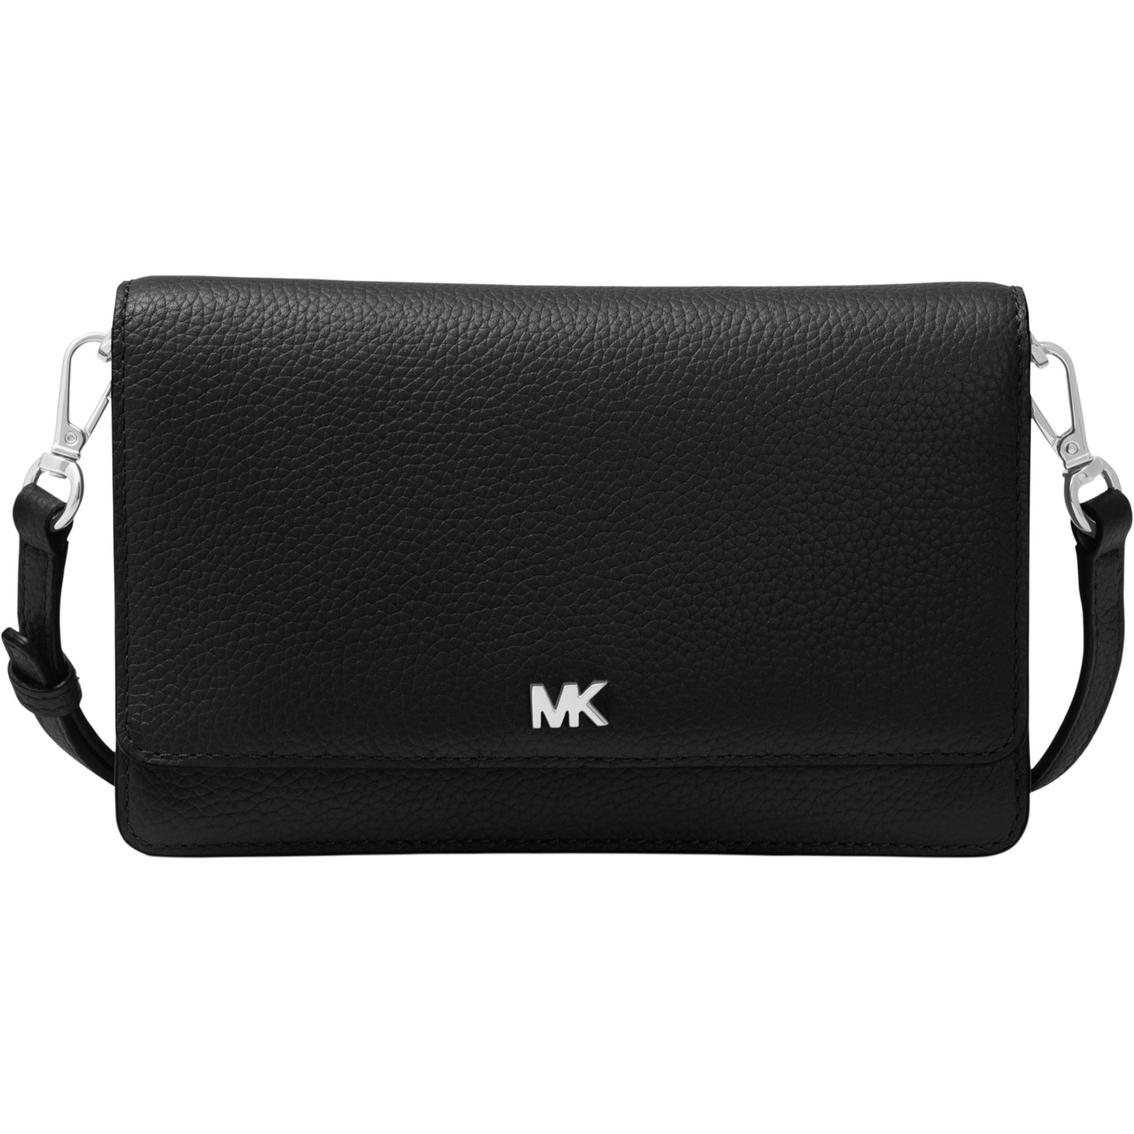 7ad1820e776b Michael Kors Women s Leather Phone Crossbody Pearl Grey